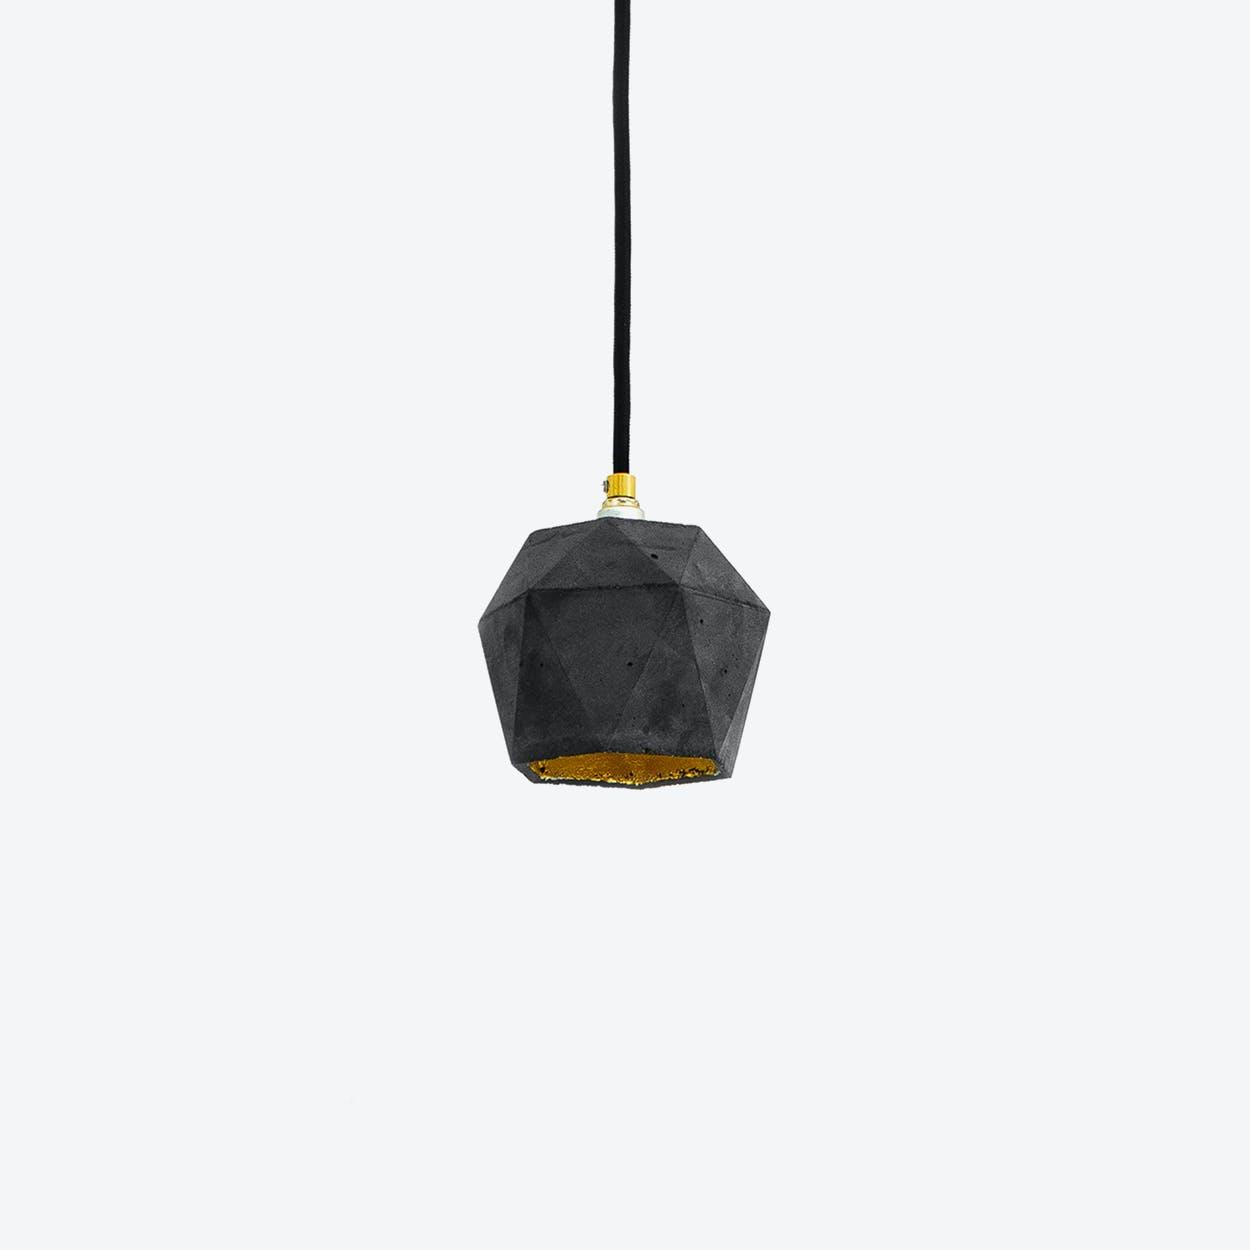 Concrete Pendant Light Triangle Small T2 in Dark Grey and Gold